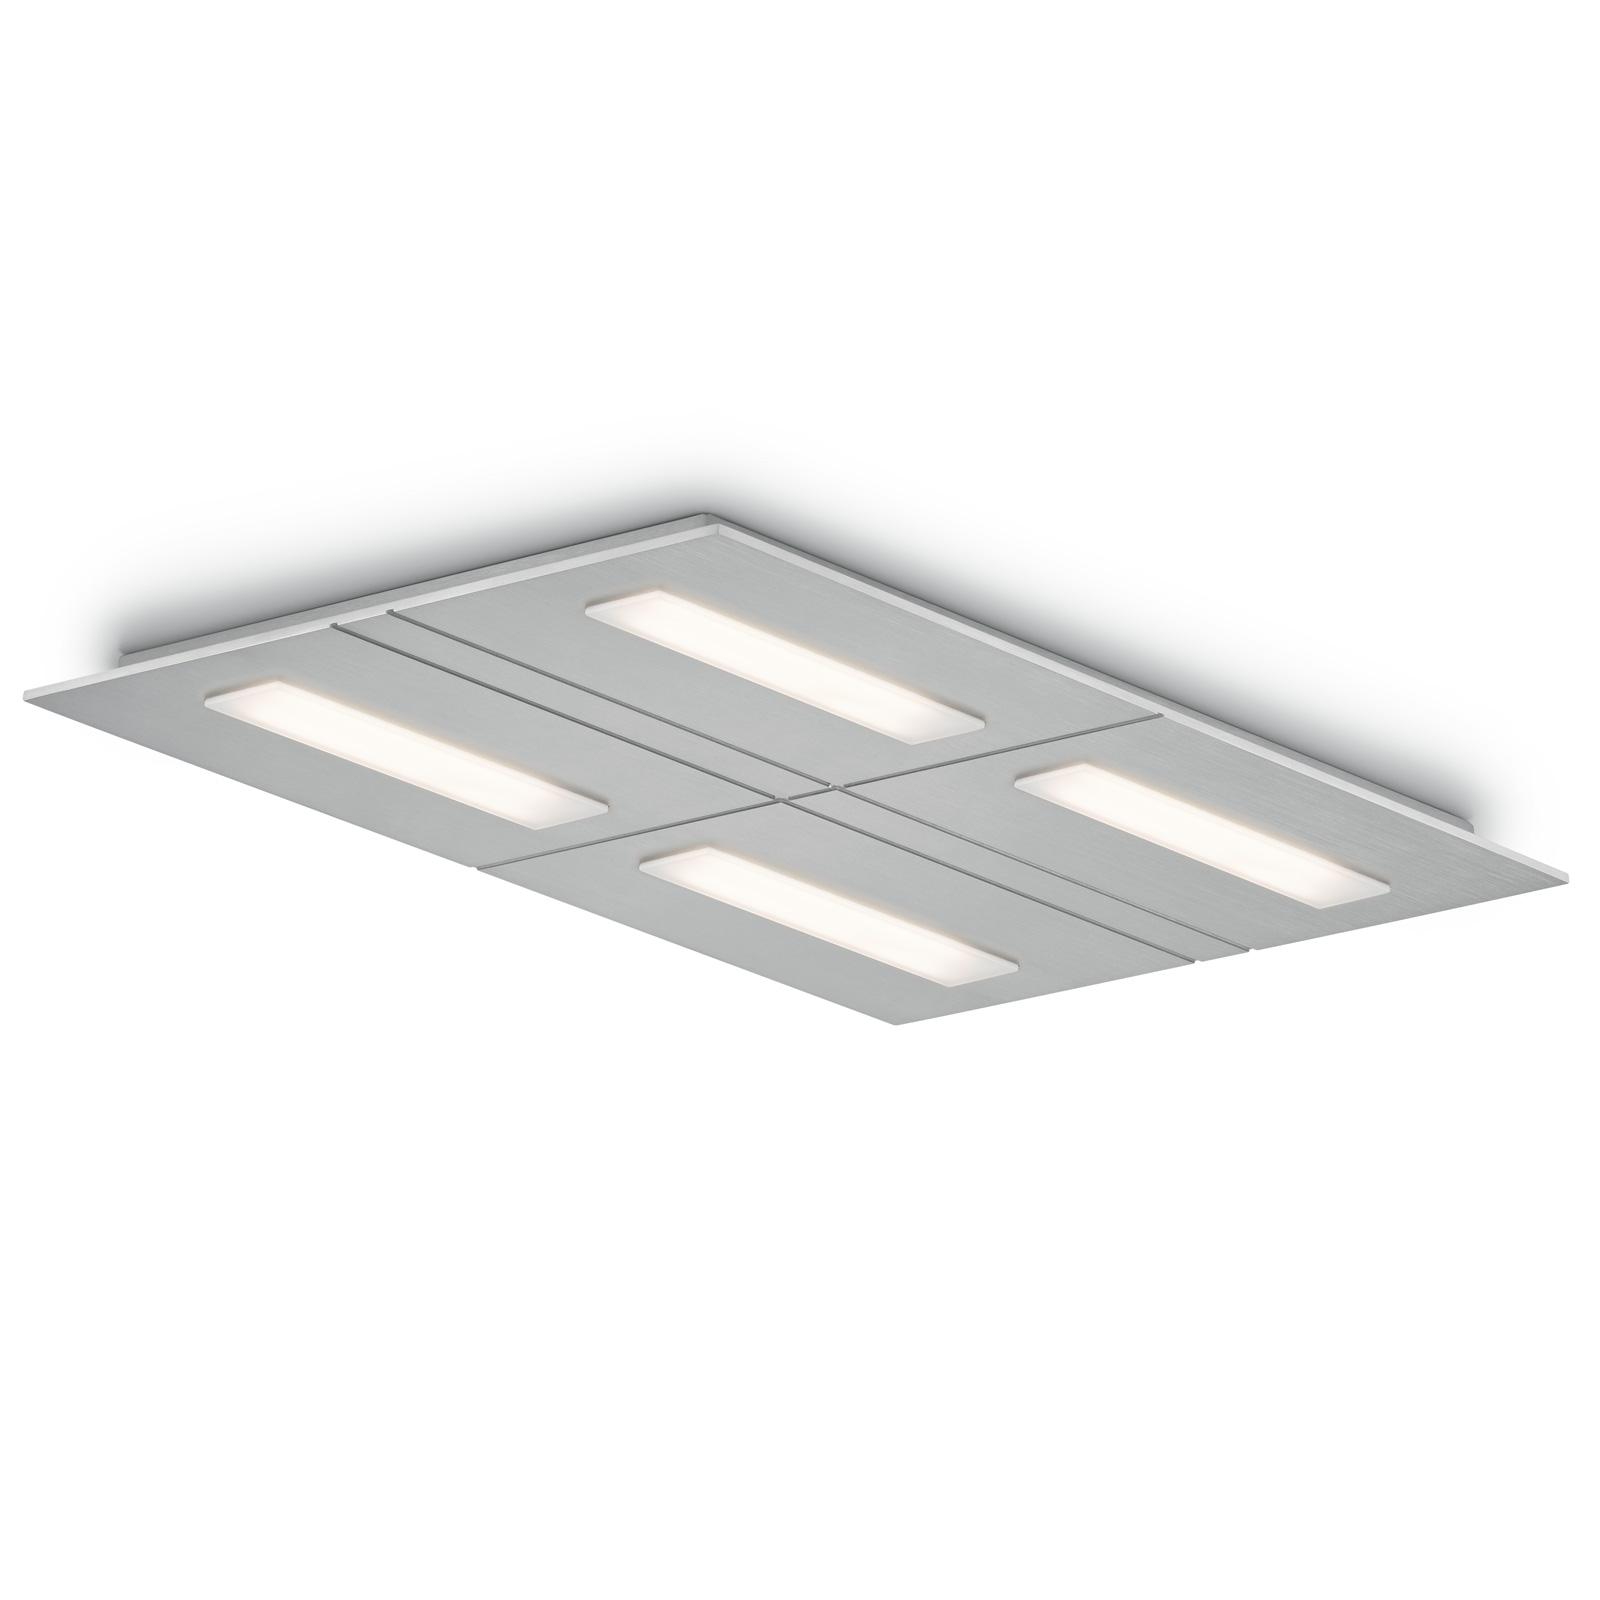 LED-taklampe Sina-4, dim-til-varm, 4 lyskilder